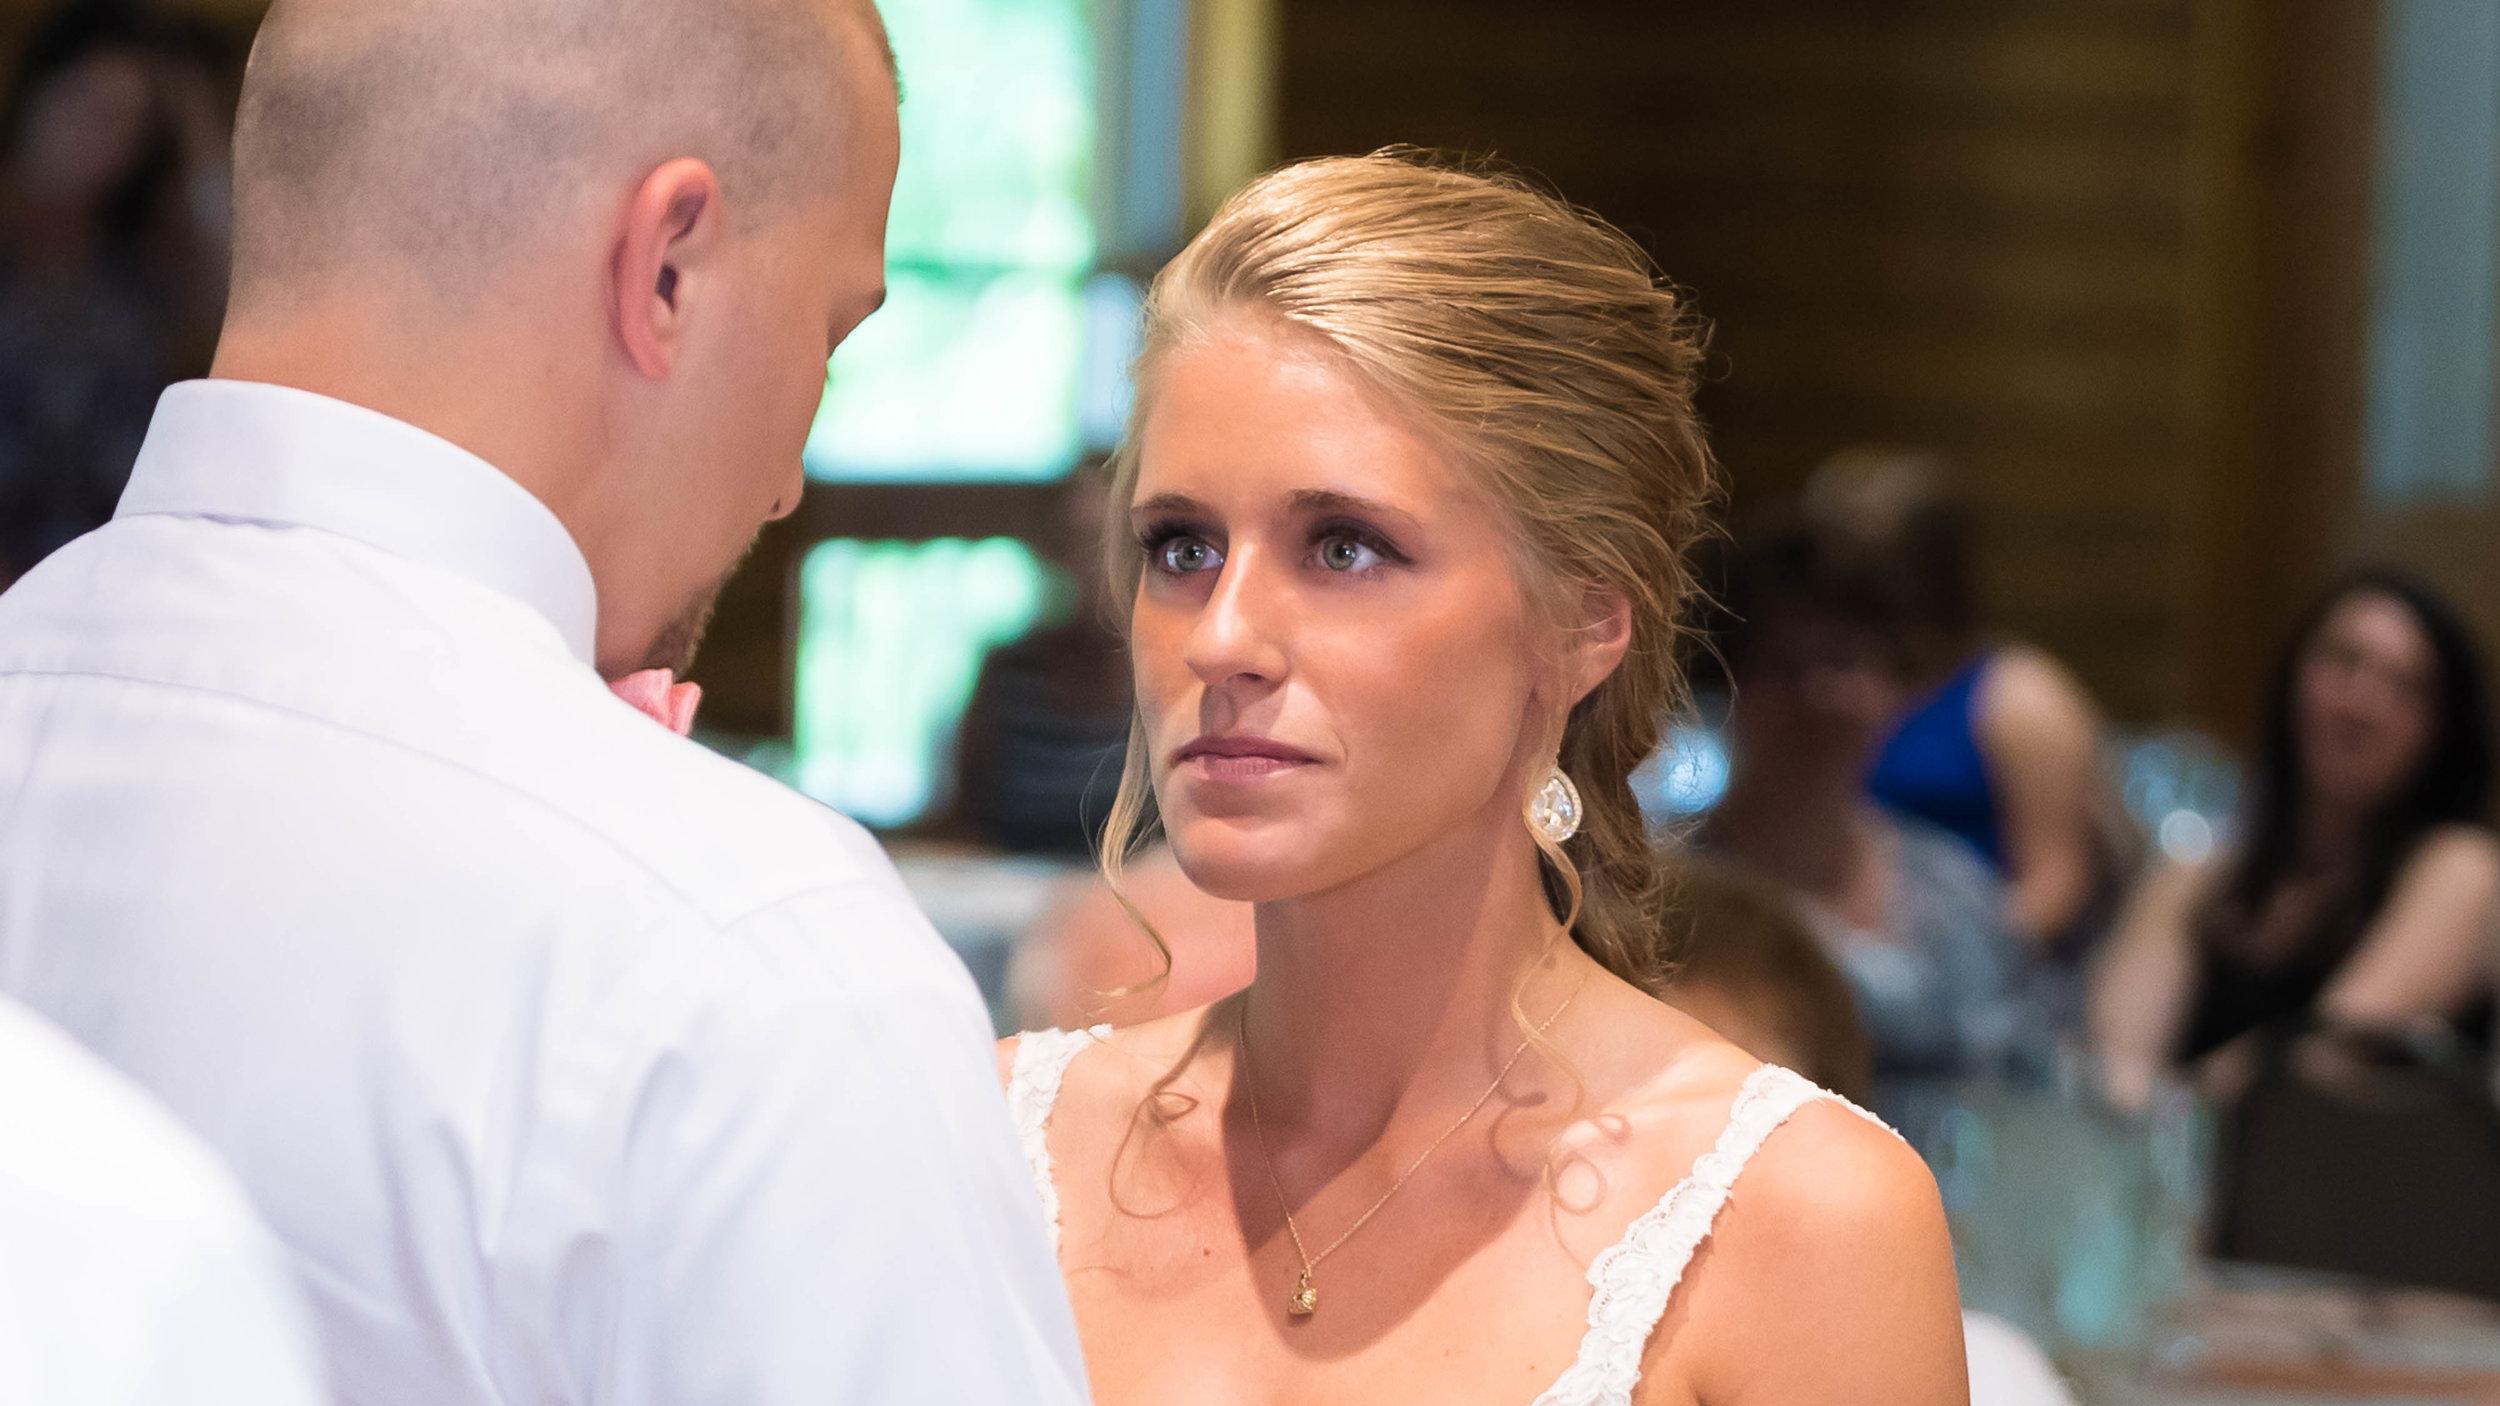 Wedding-ceremony-mayernik-center-3.jpg